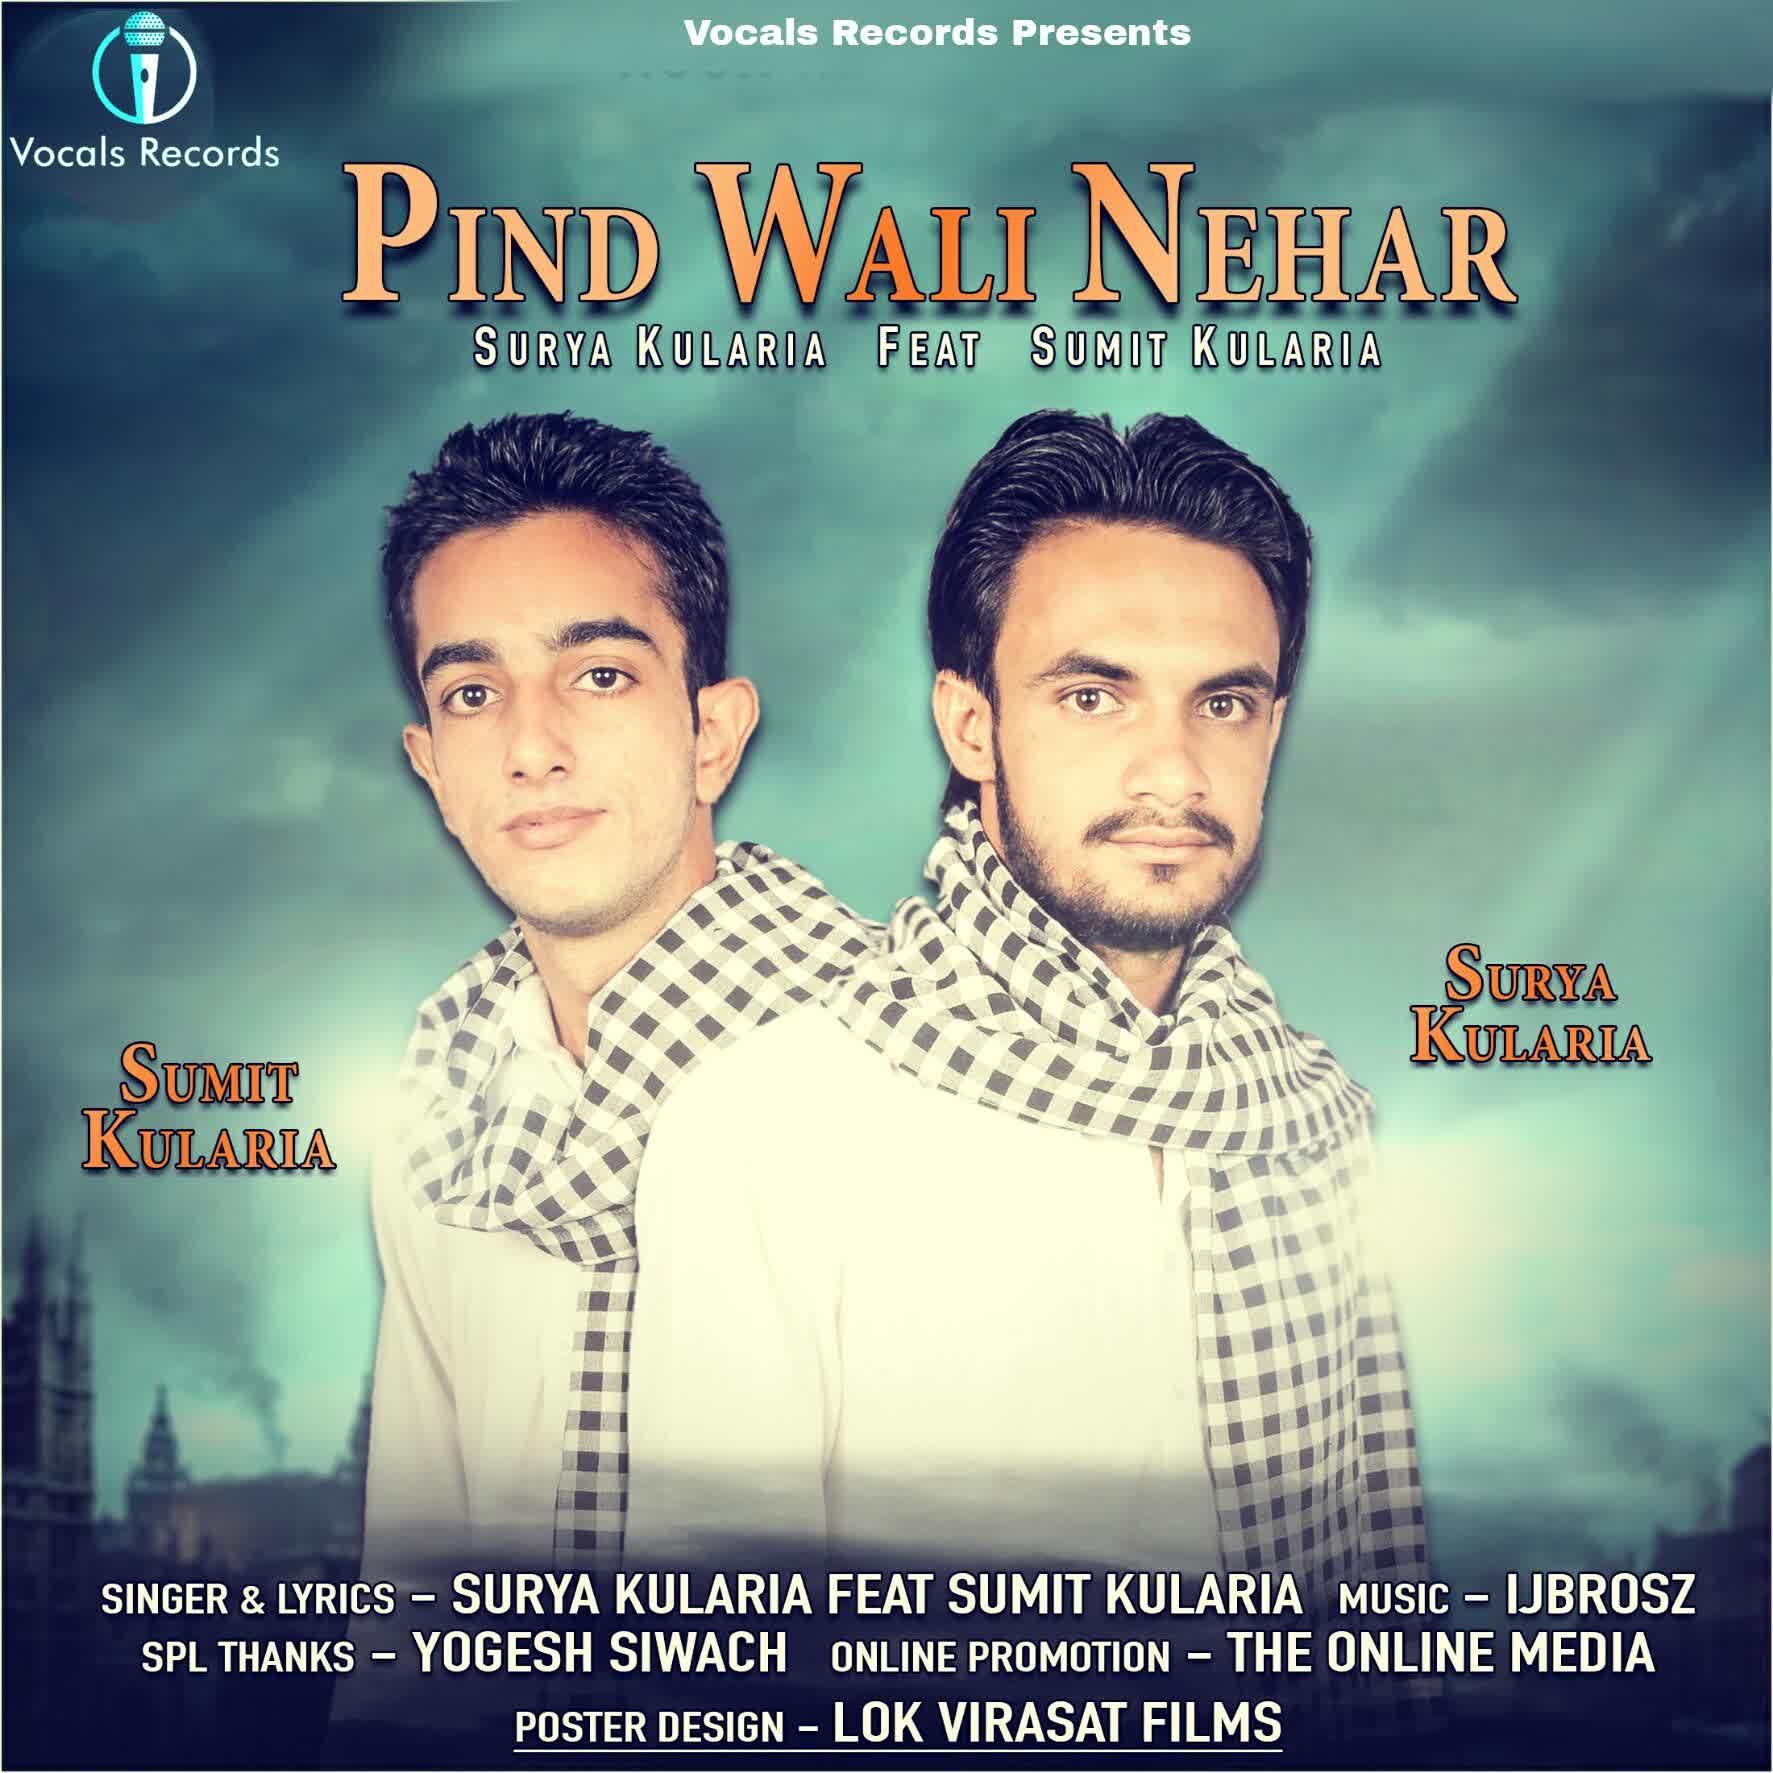 Pind Wali Nehar Surya Kularia